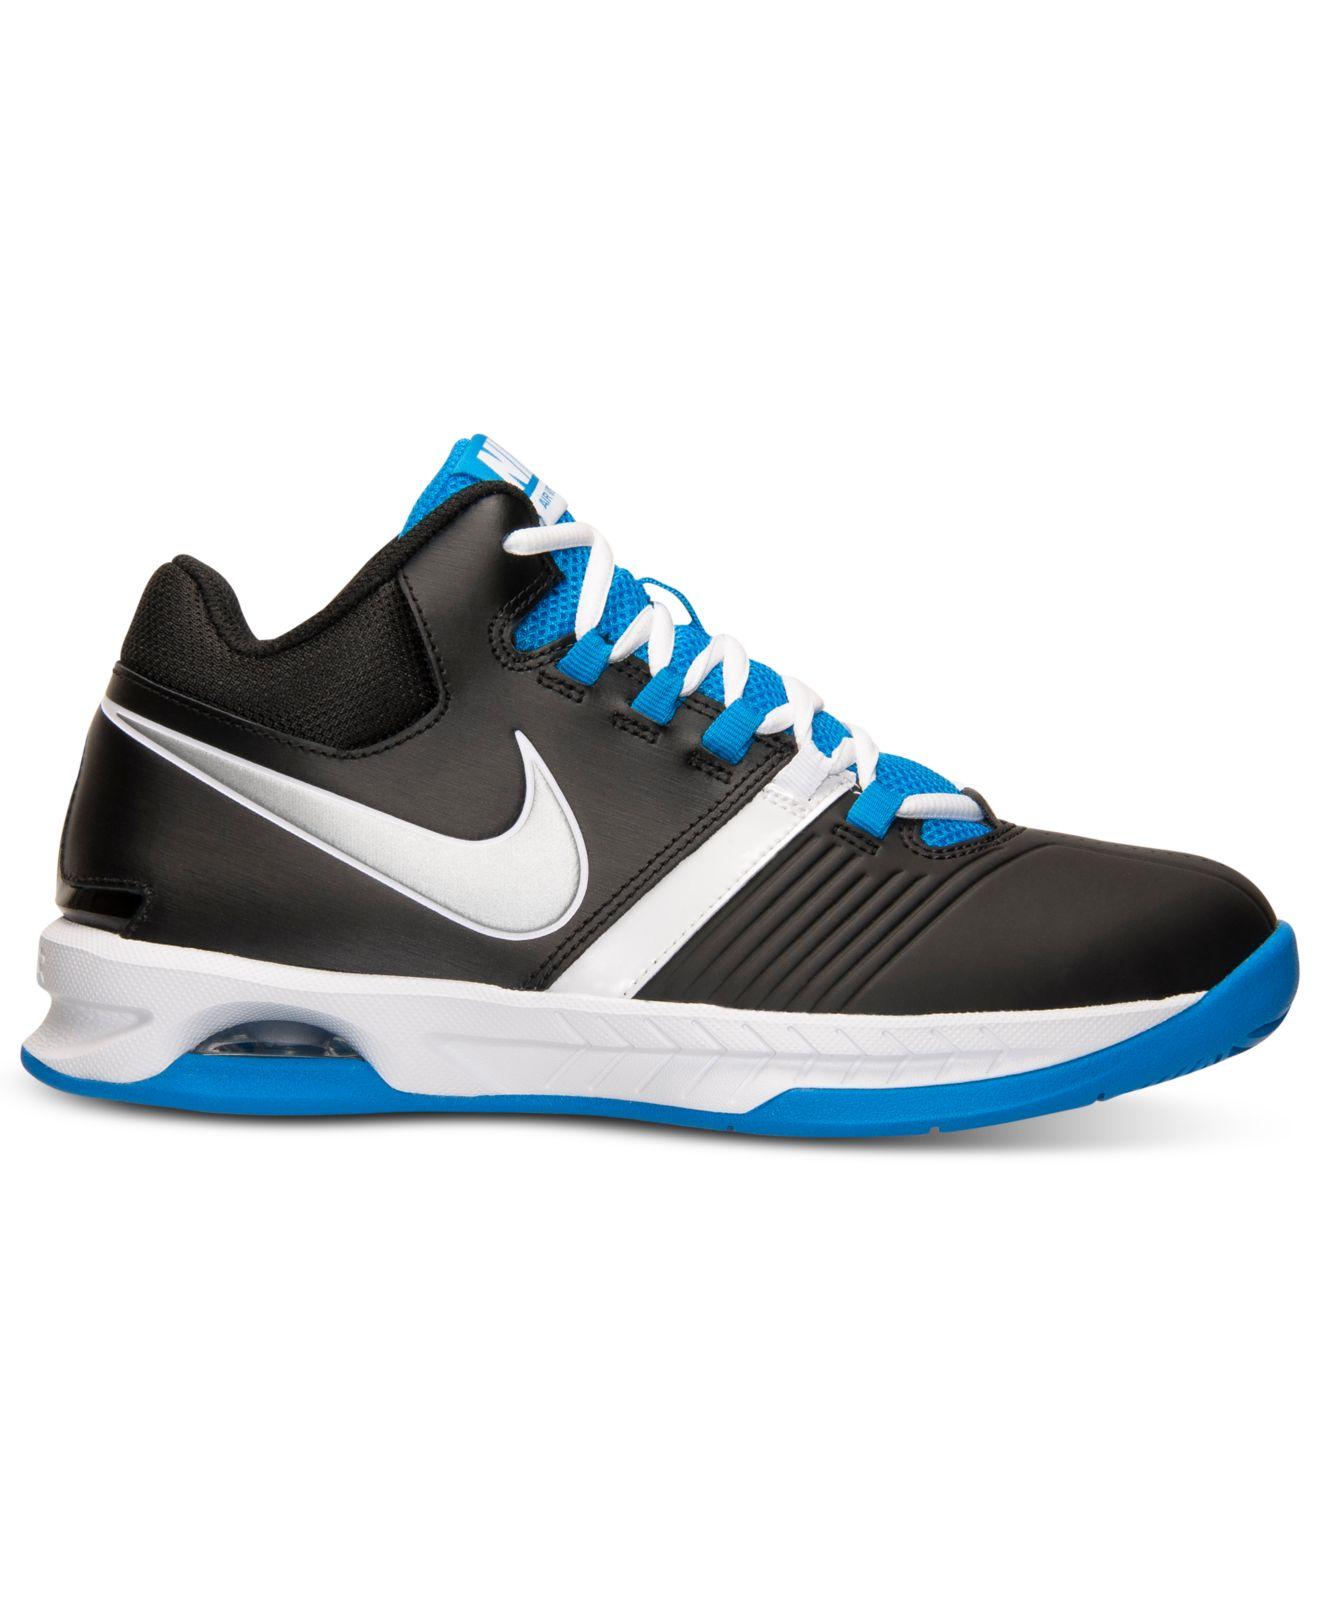 air visi pro 5 buy clothes shoes online